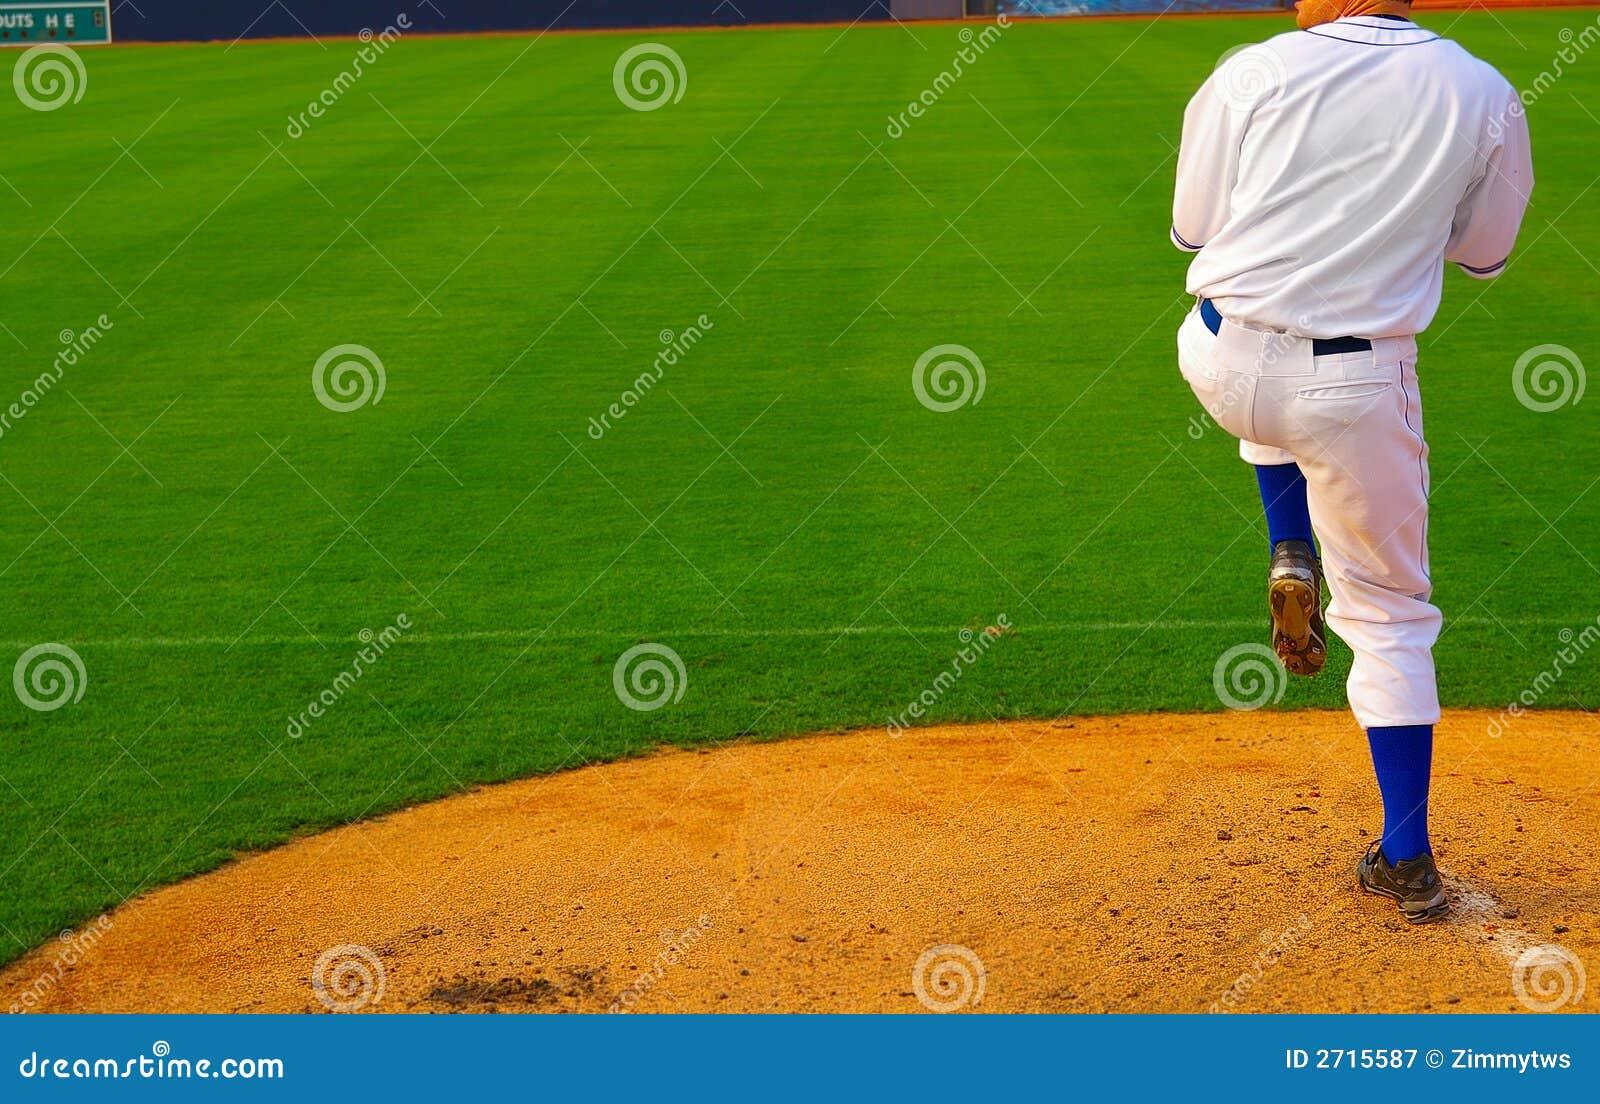 Miotacz baseballu